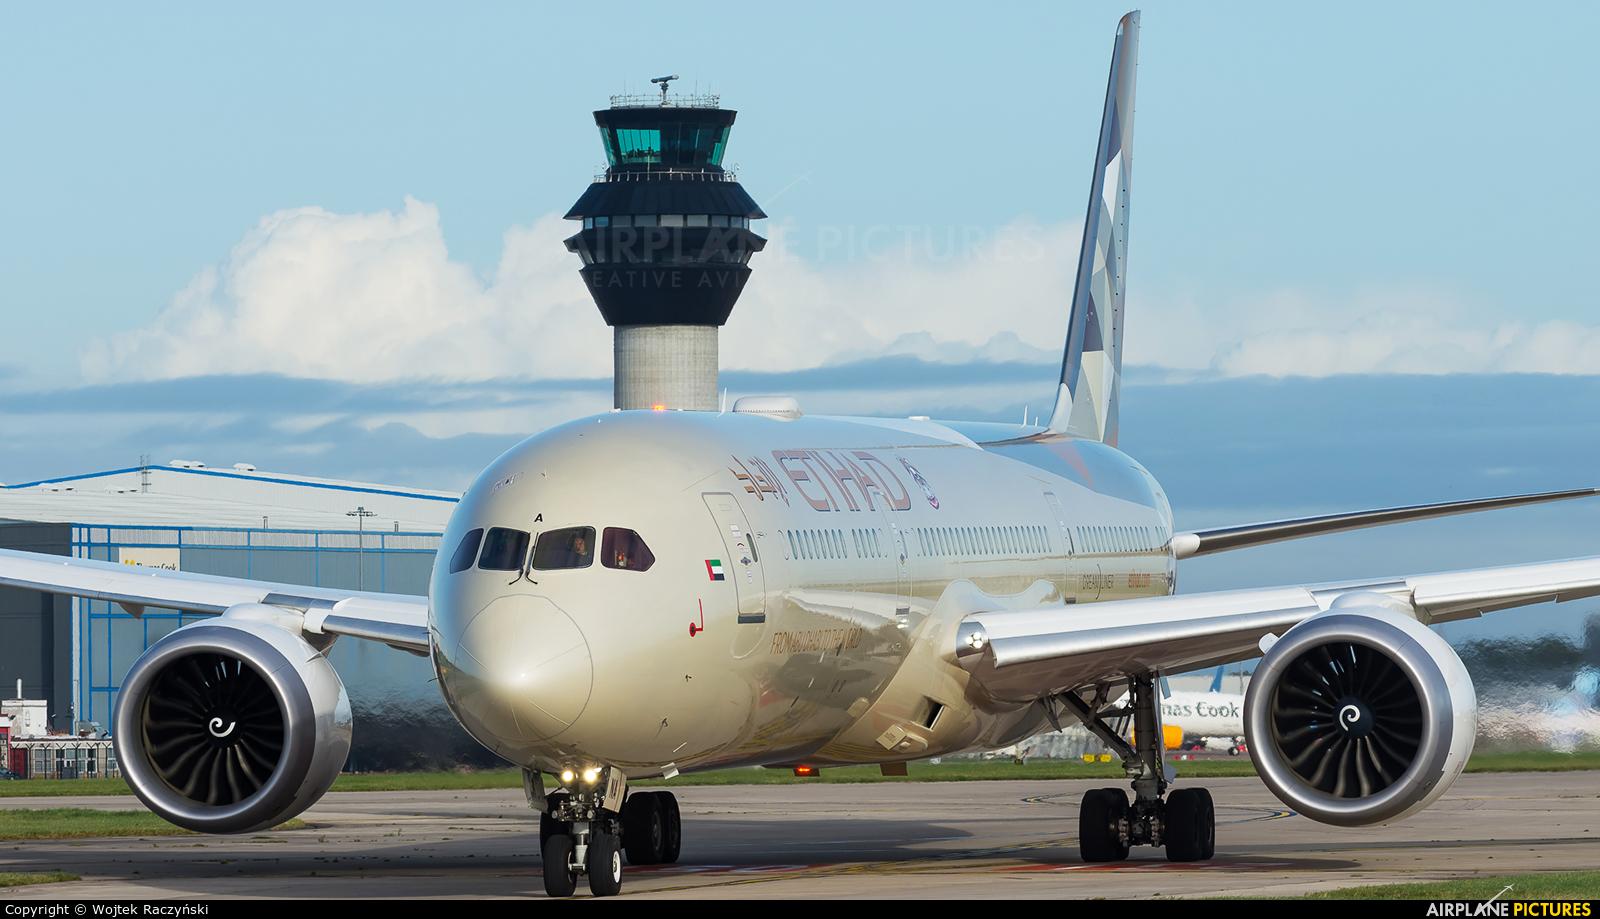 Etihad Airways A6-BNA aircraft at Manchester